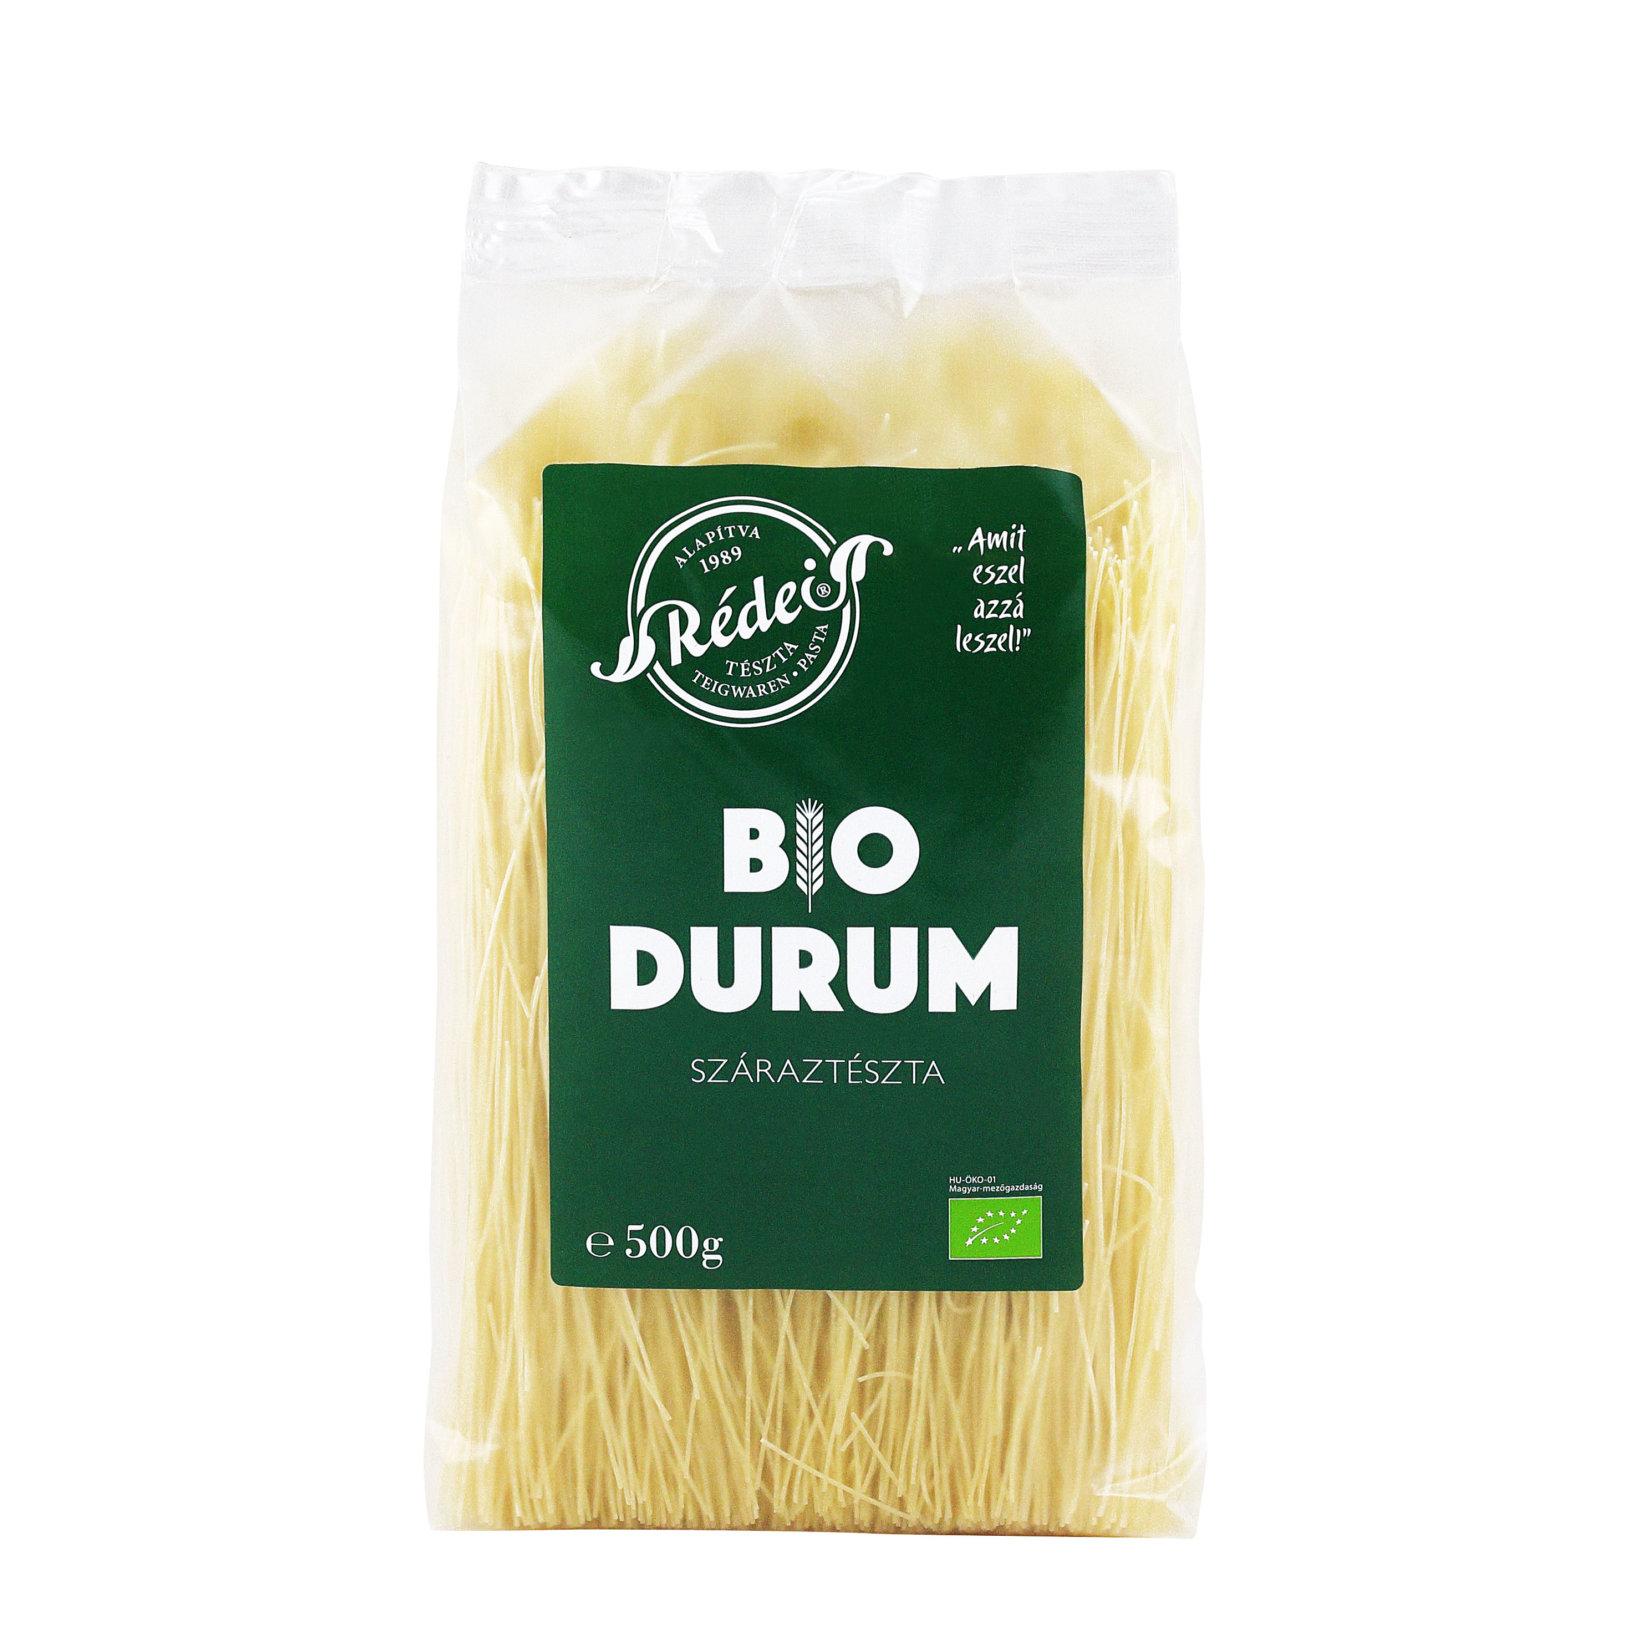 BioDurum_cernametelt_500g_IMG_6982